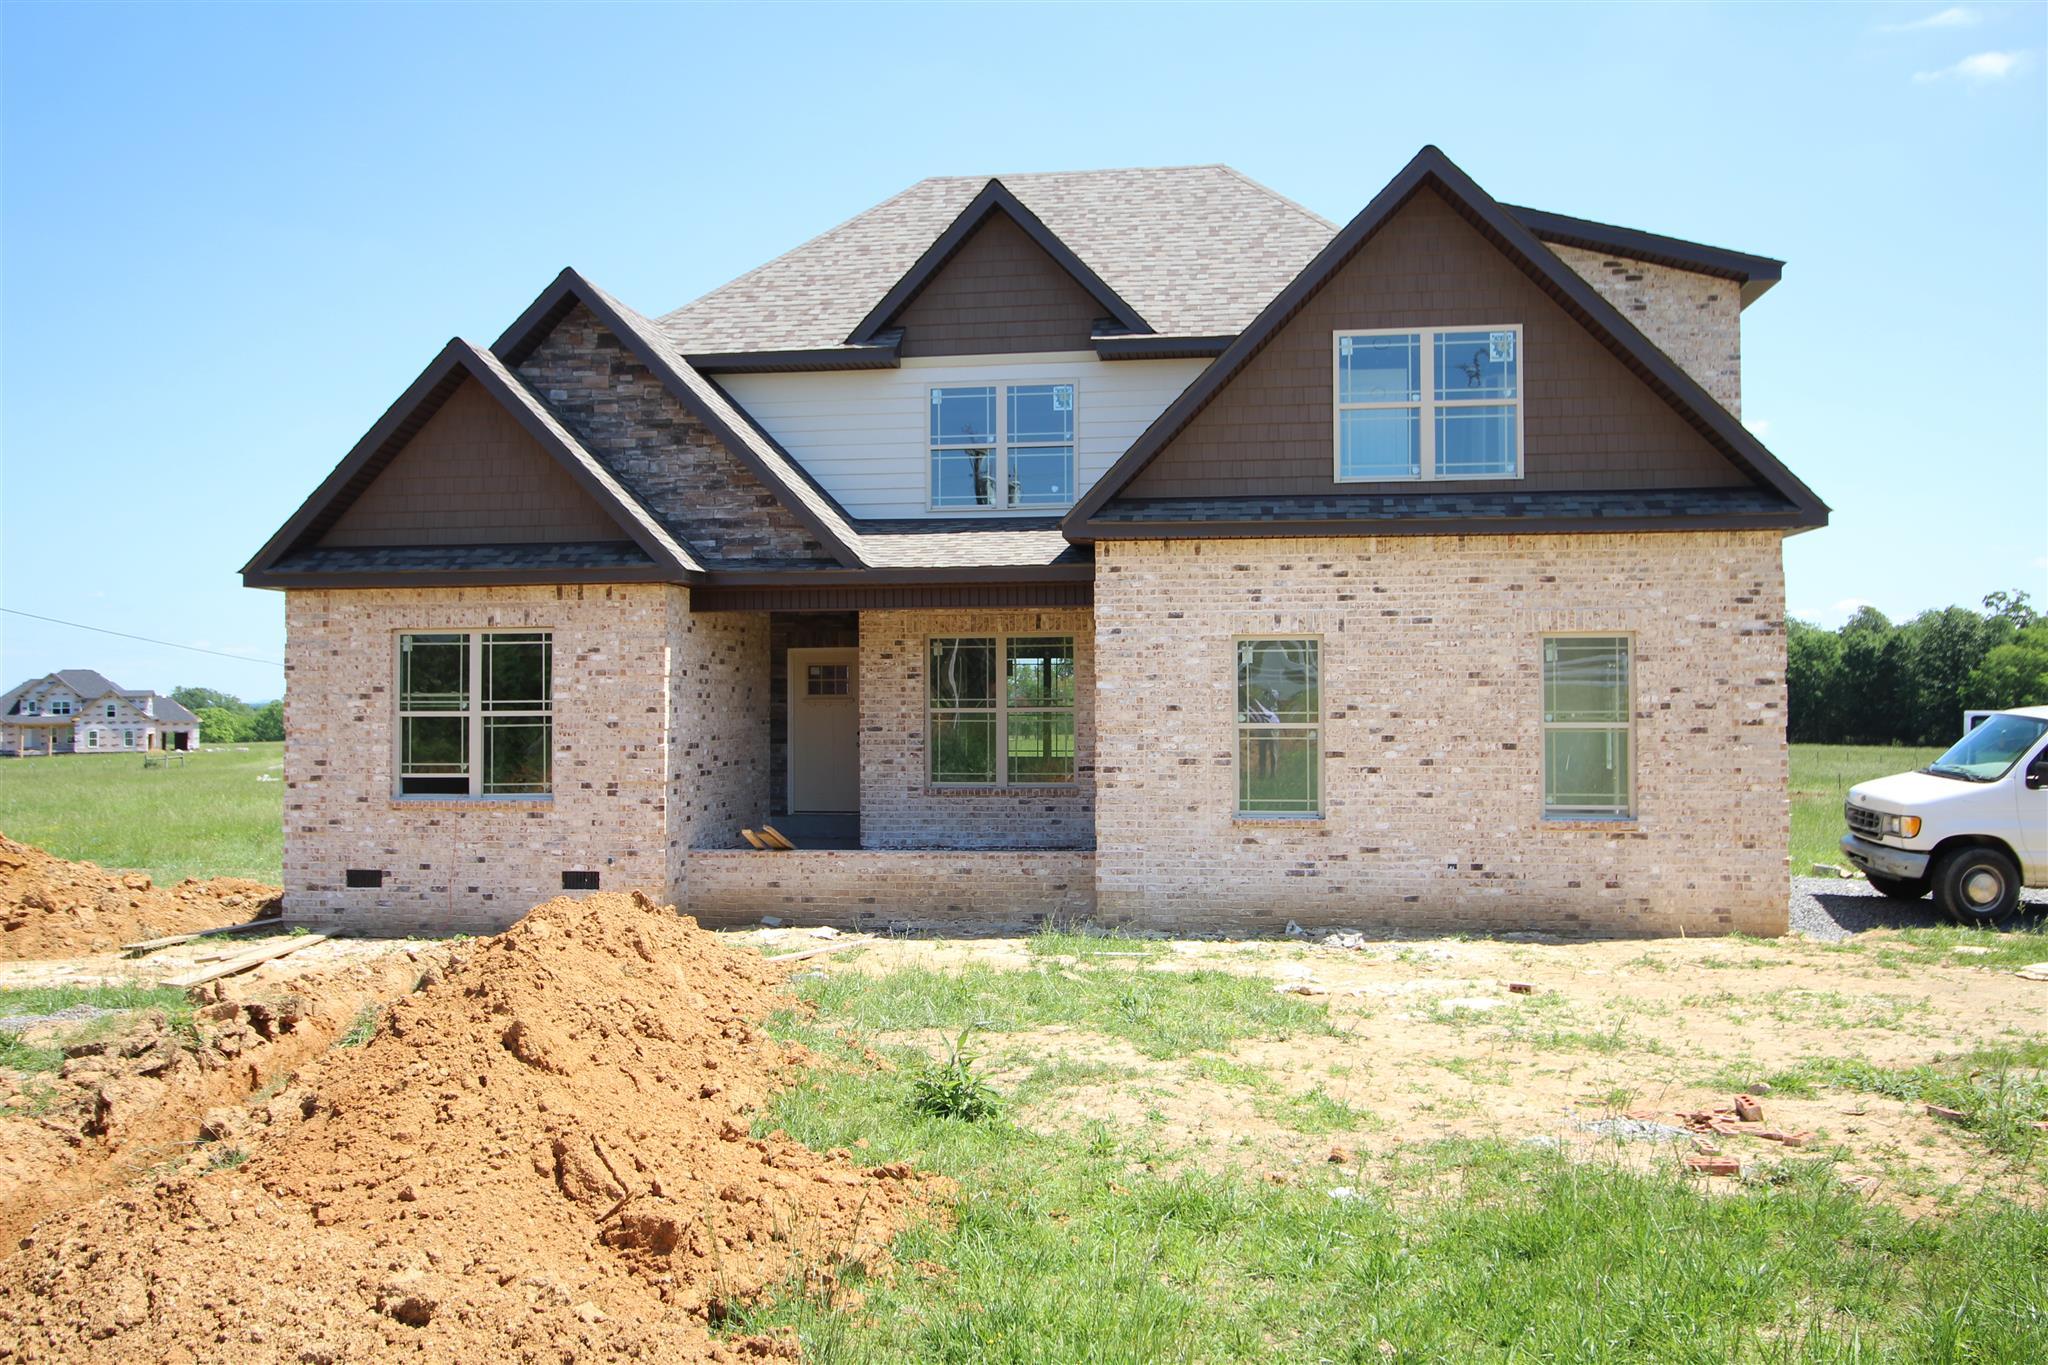 8445 Bradyville Pike (Lot 2), Murfreesboro, TN 37127